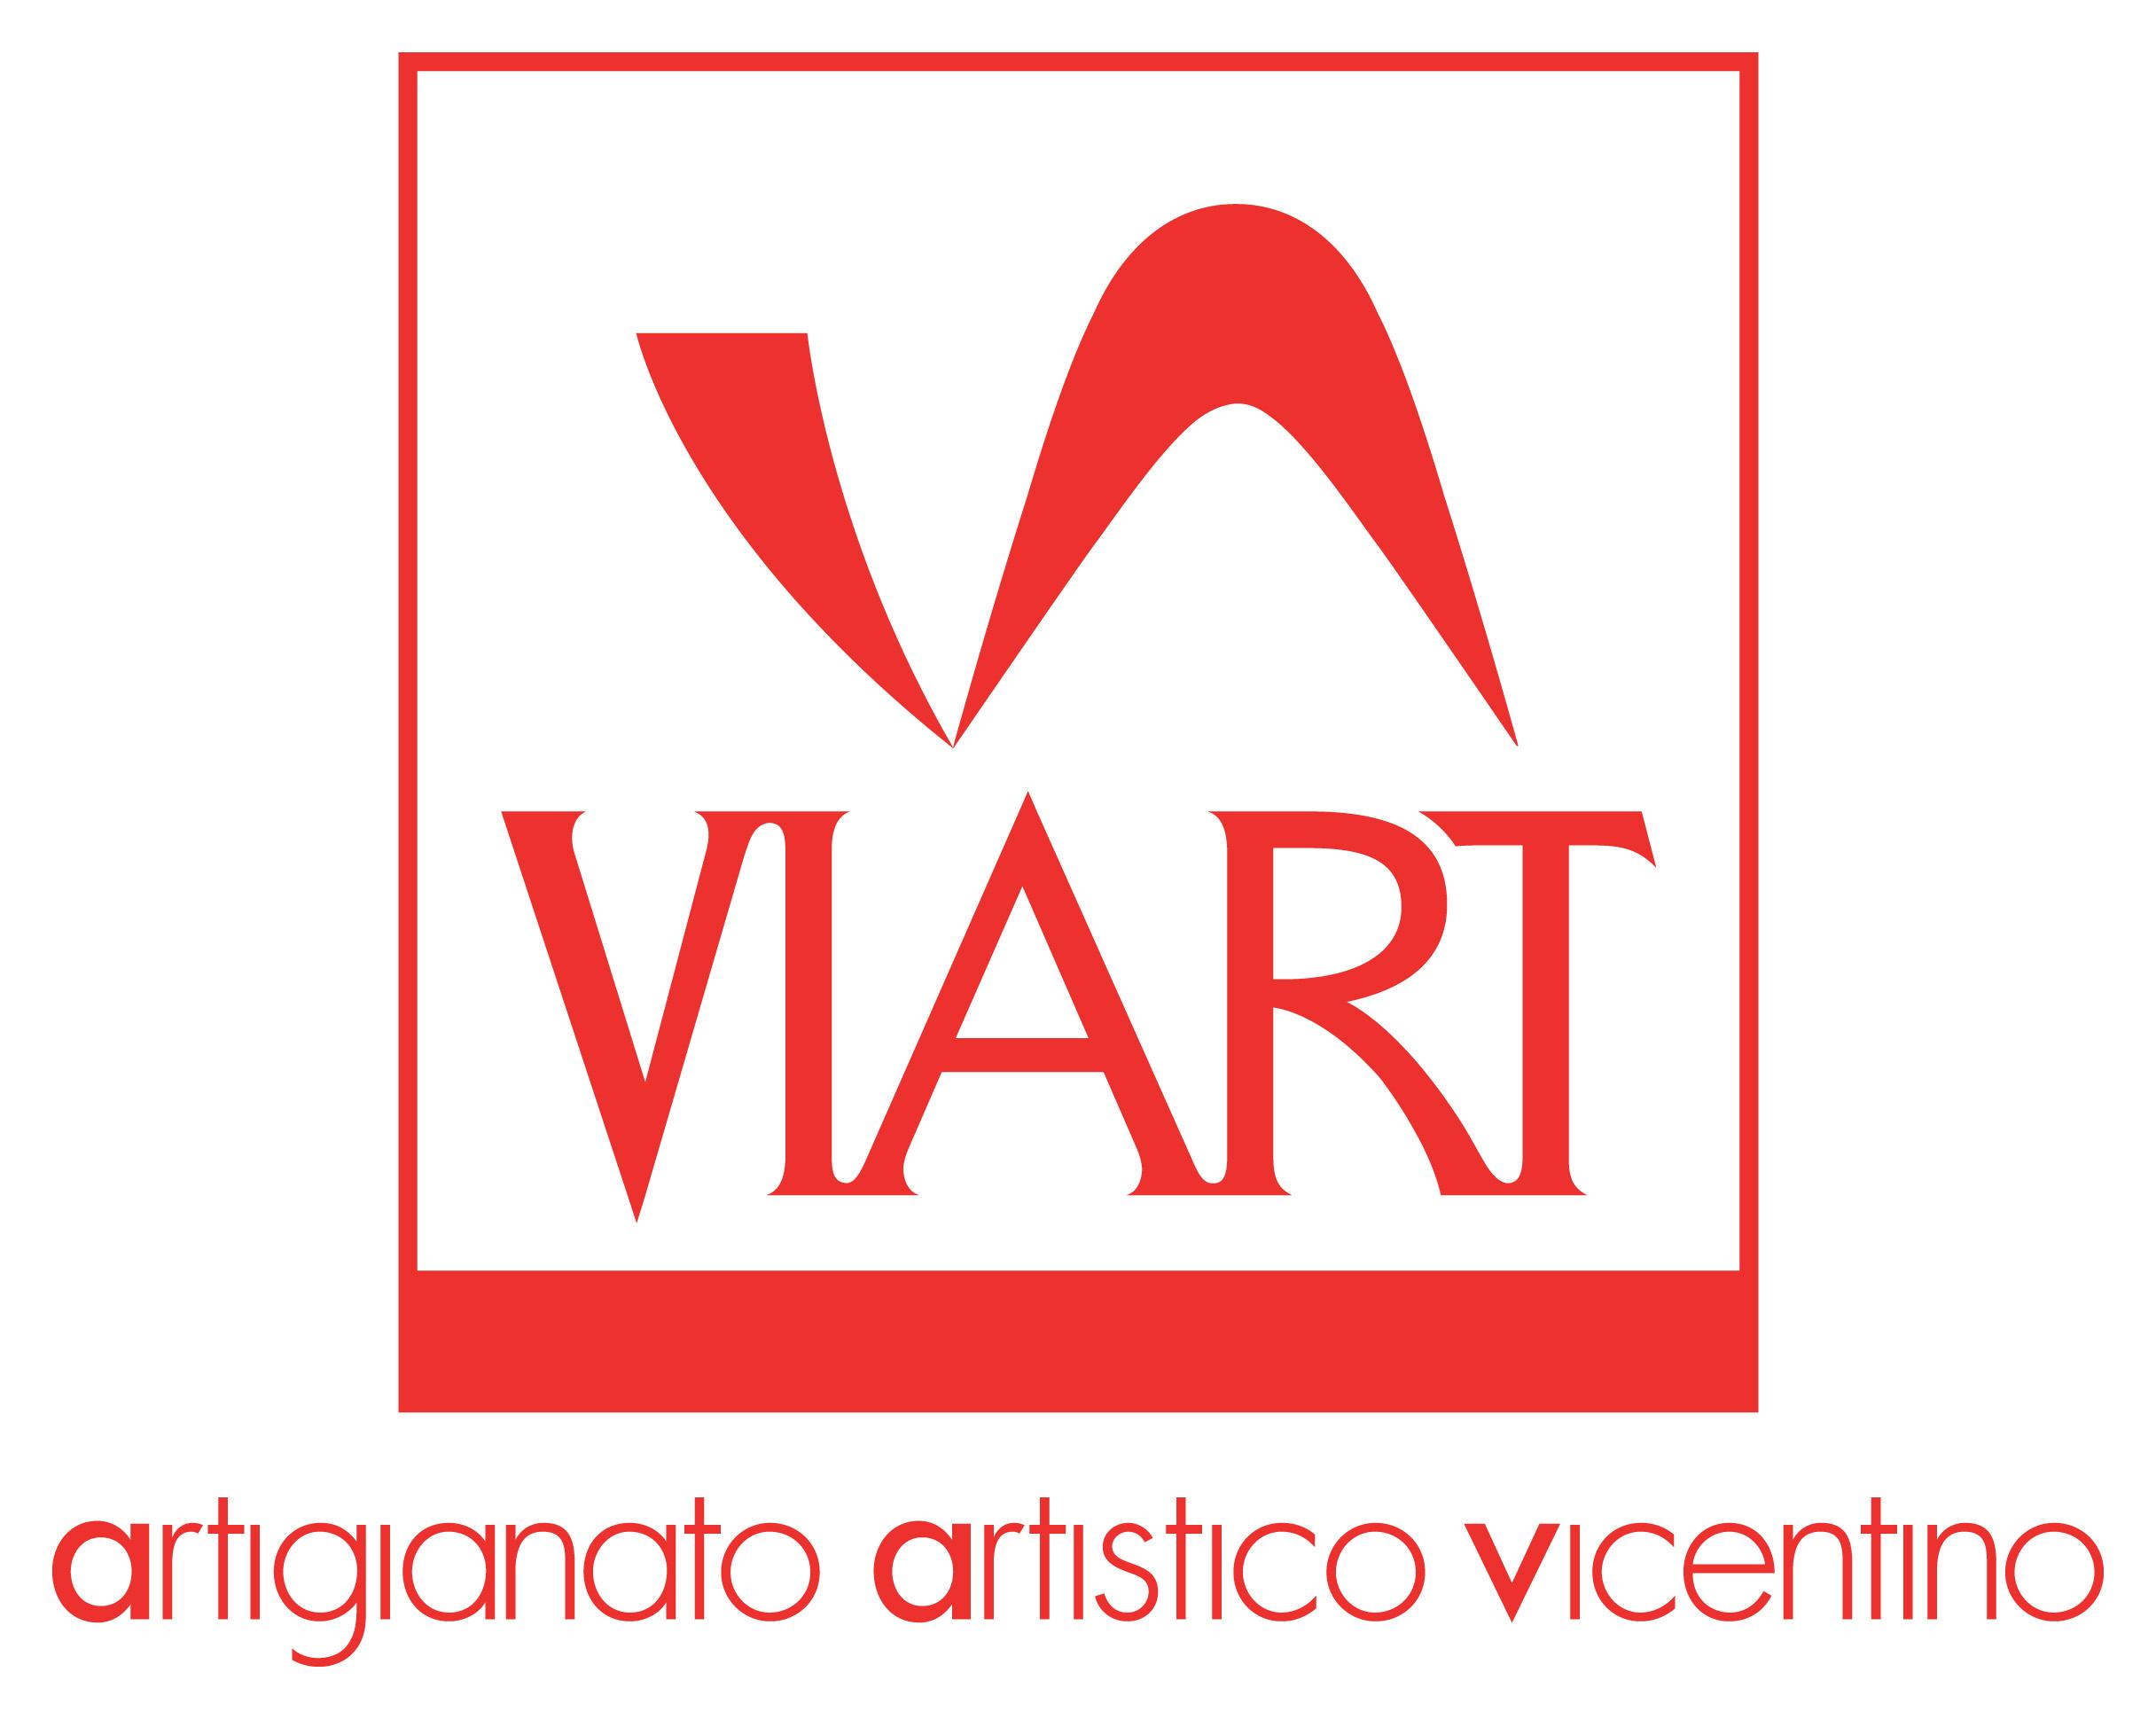 Viart